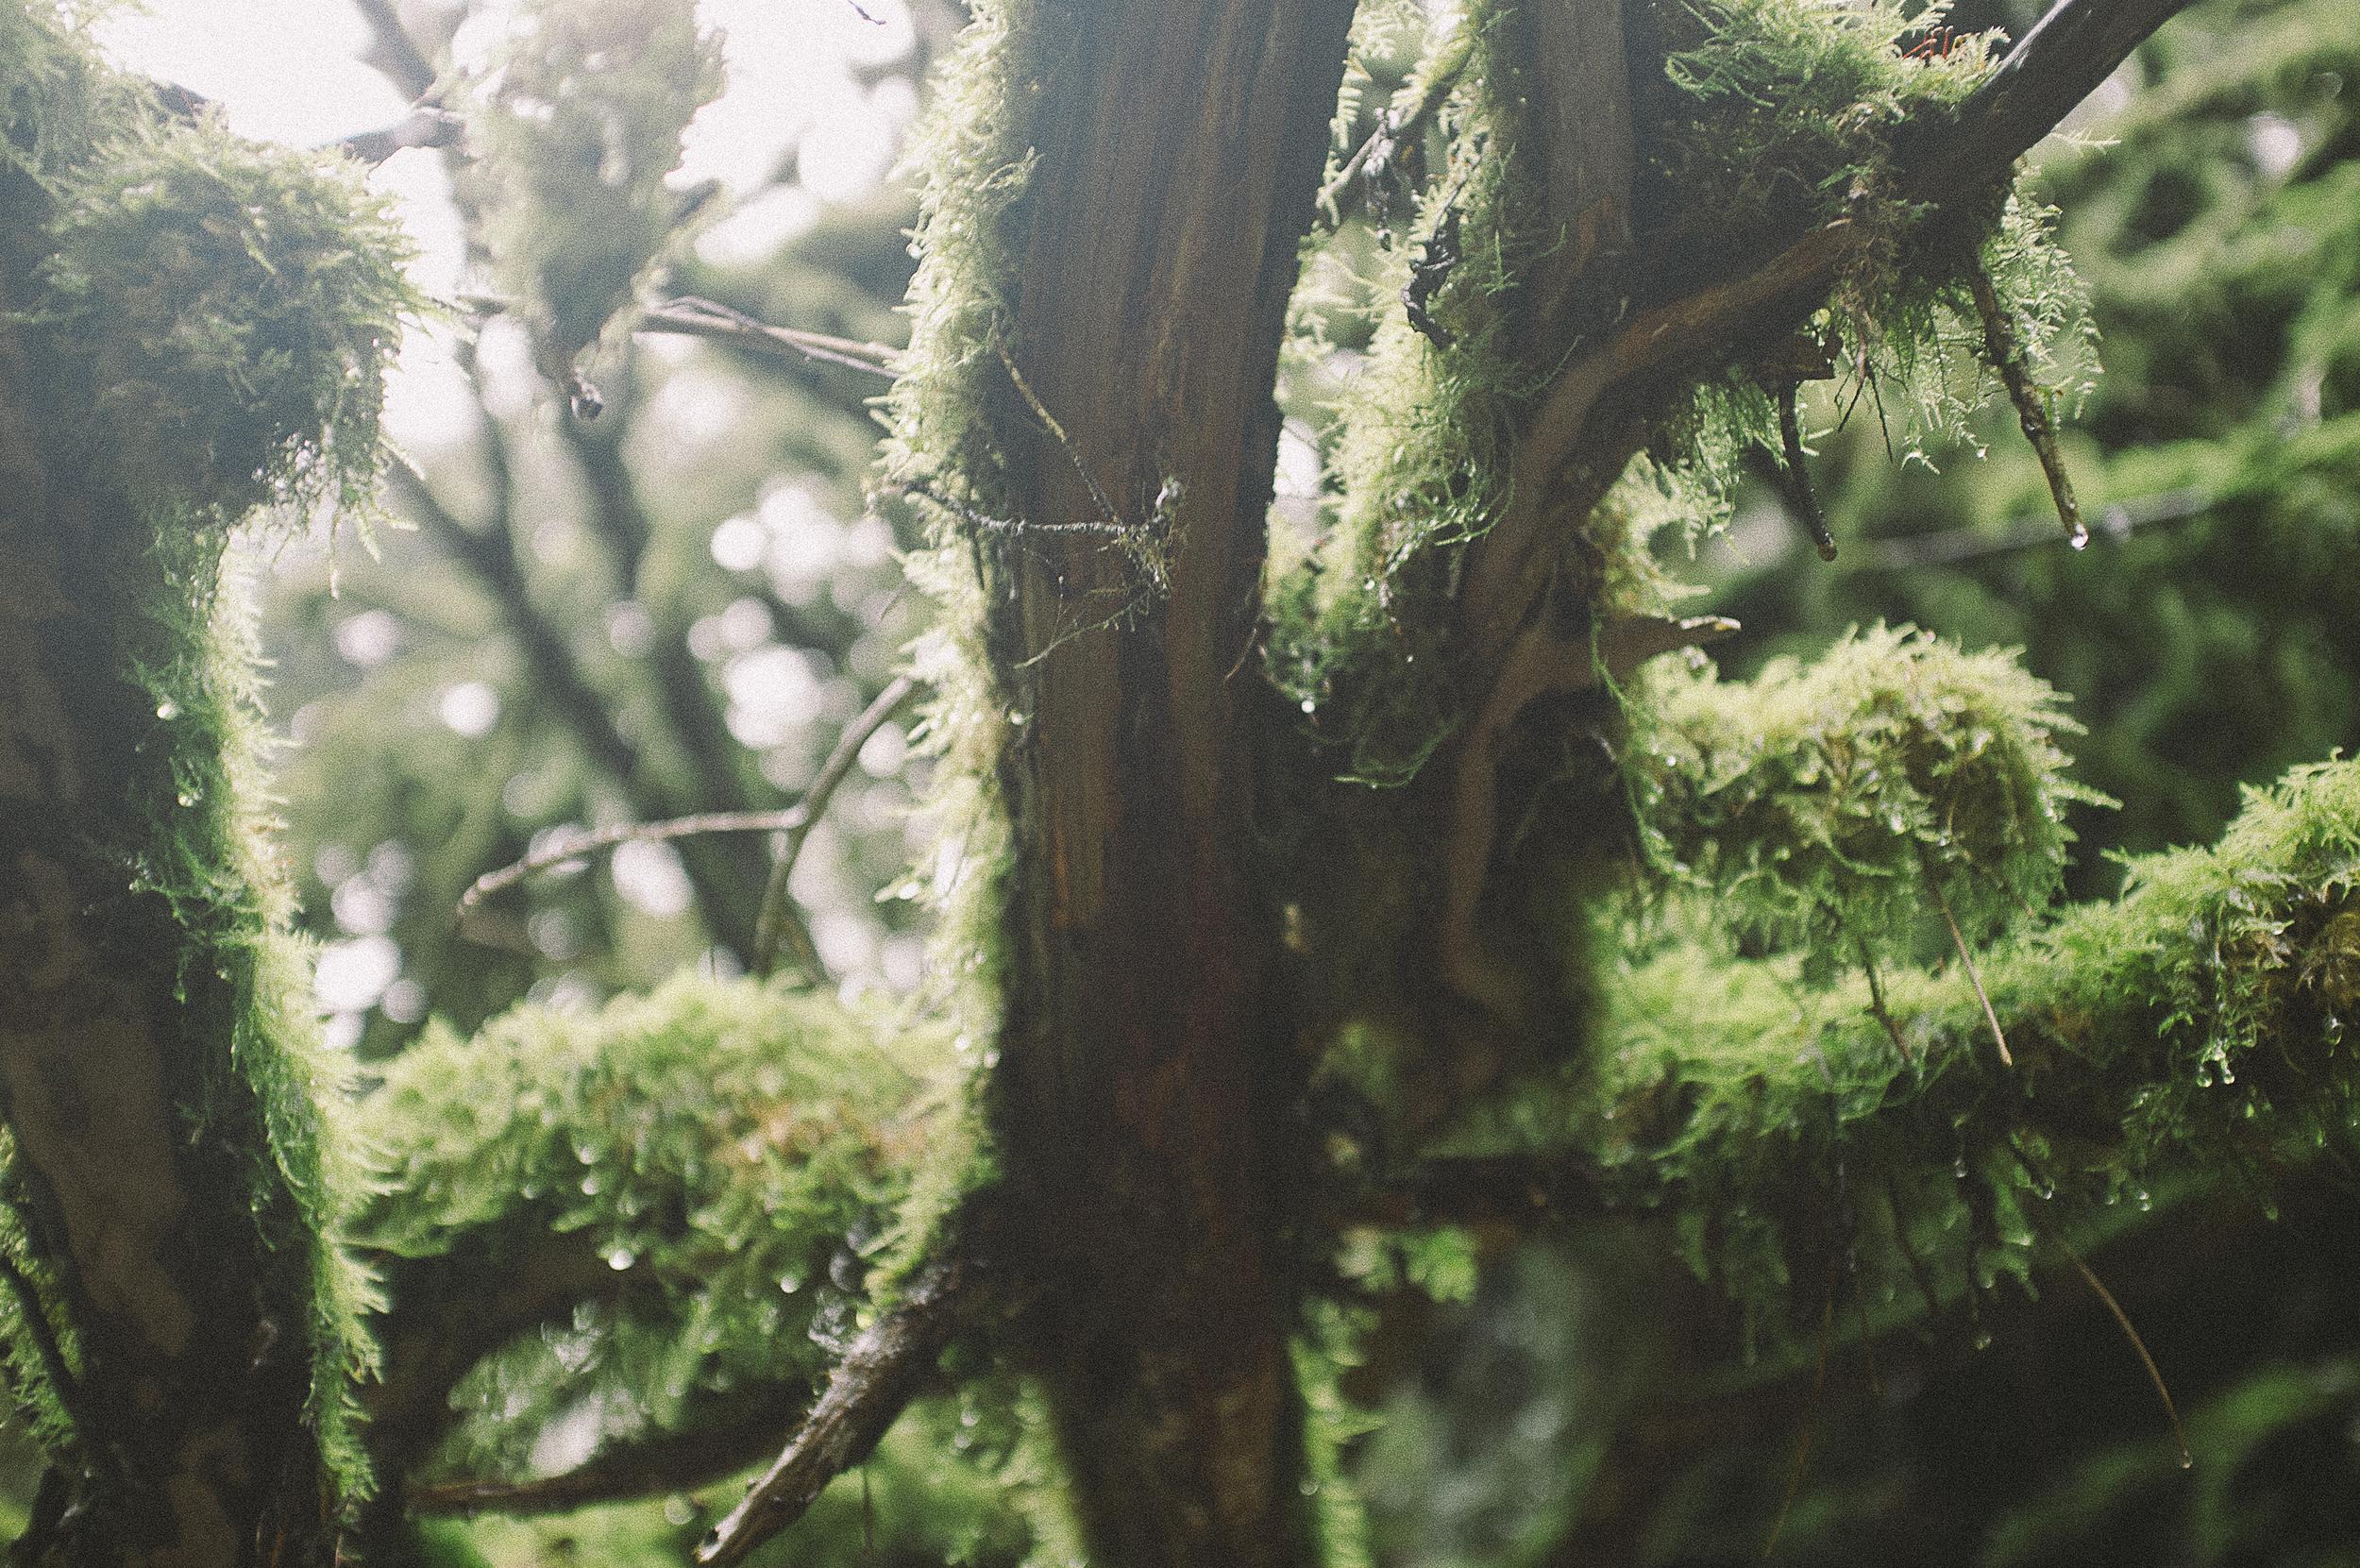 Fuji X100 Waterfall Photography-2.jpg